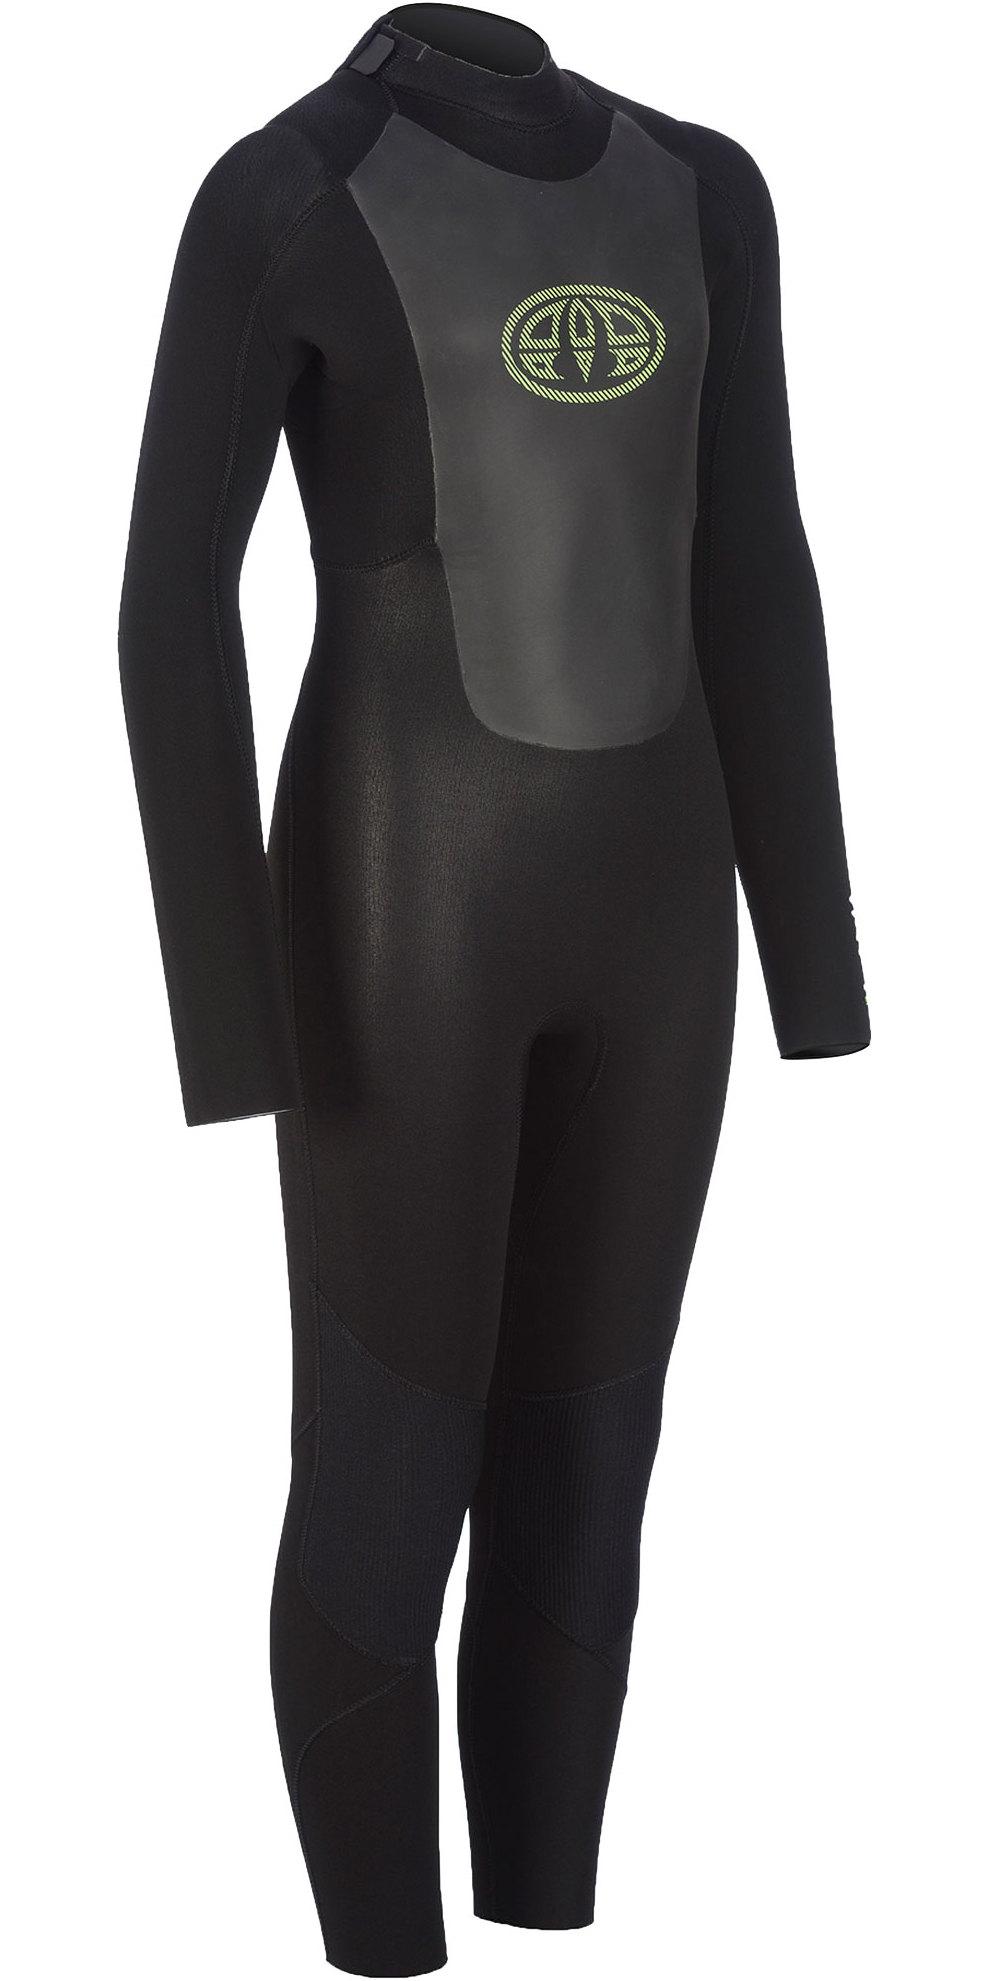 2019 Animal Junior Boys Lava 5/4/3mm GBS Back Zip Wetsuit Black AW9WQ601